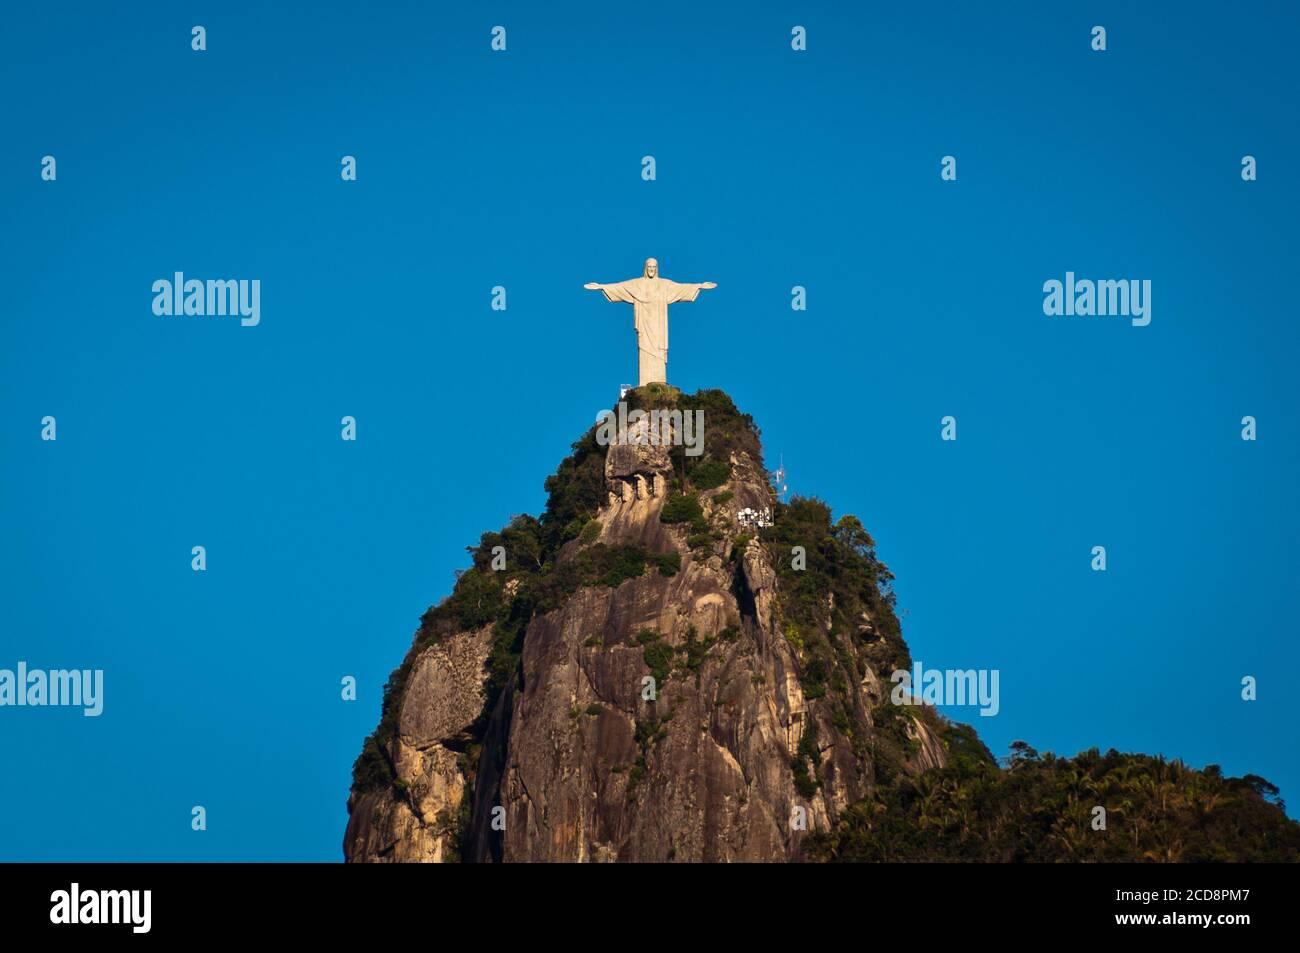 The famous landmark of Rio de Janeiro - Christ the Redeemer statue on the Corcovado mountain Stock Photo